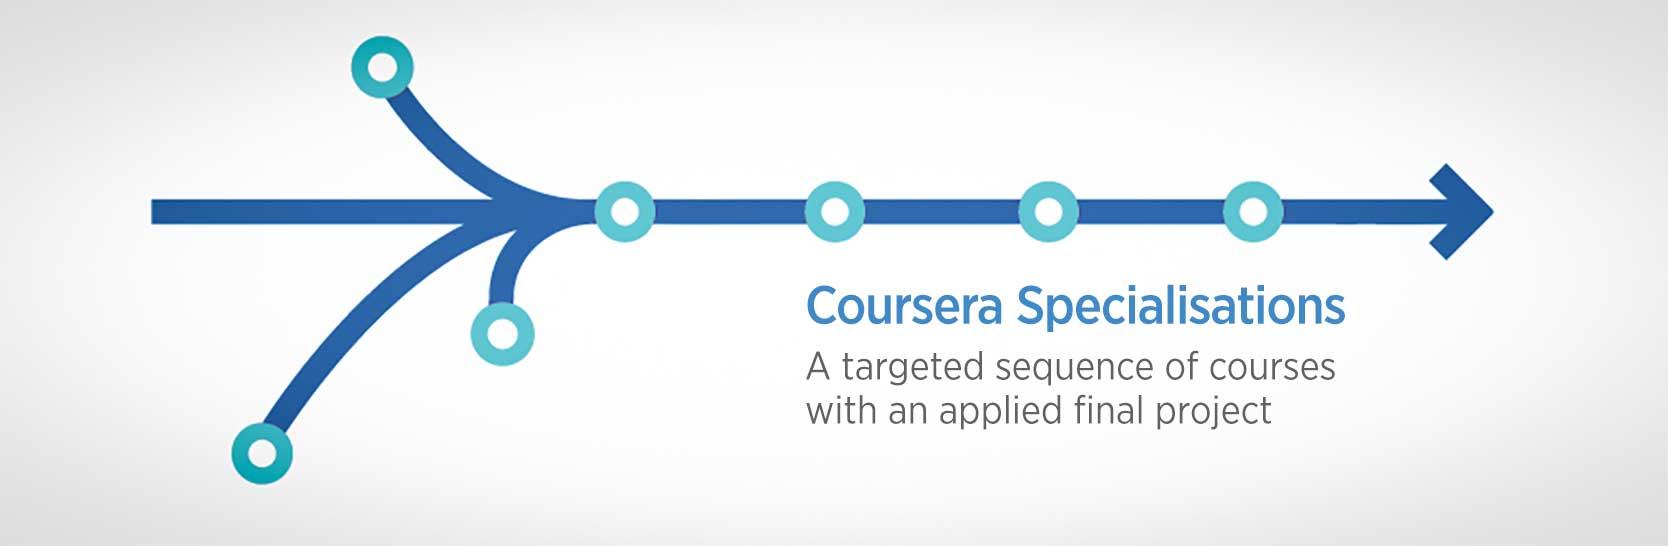 specialization coursera